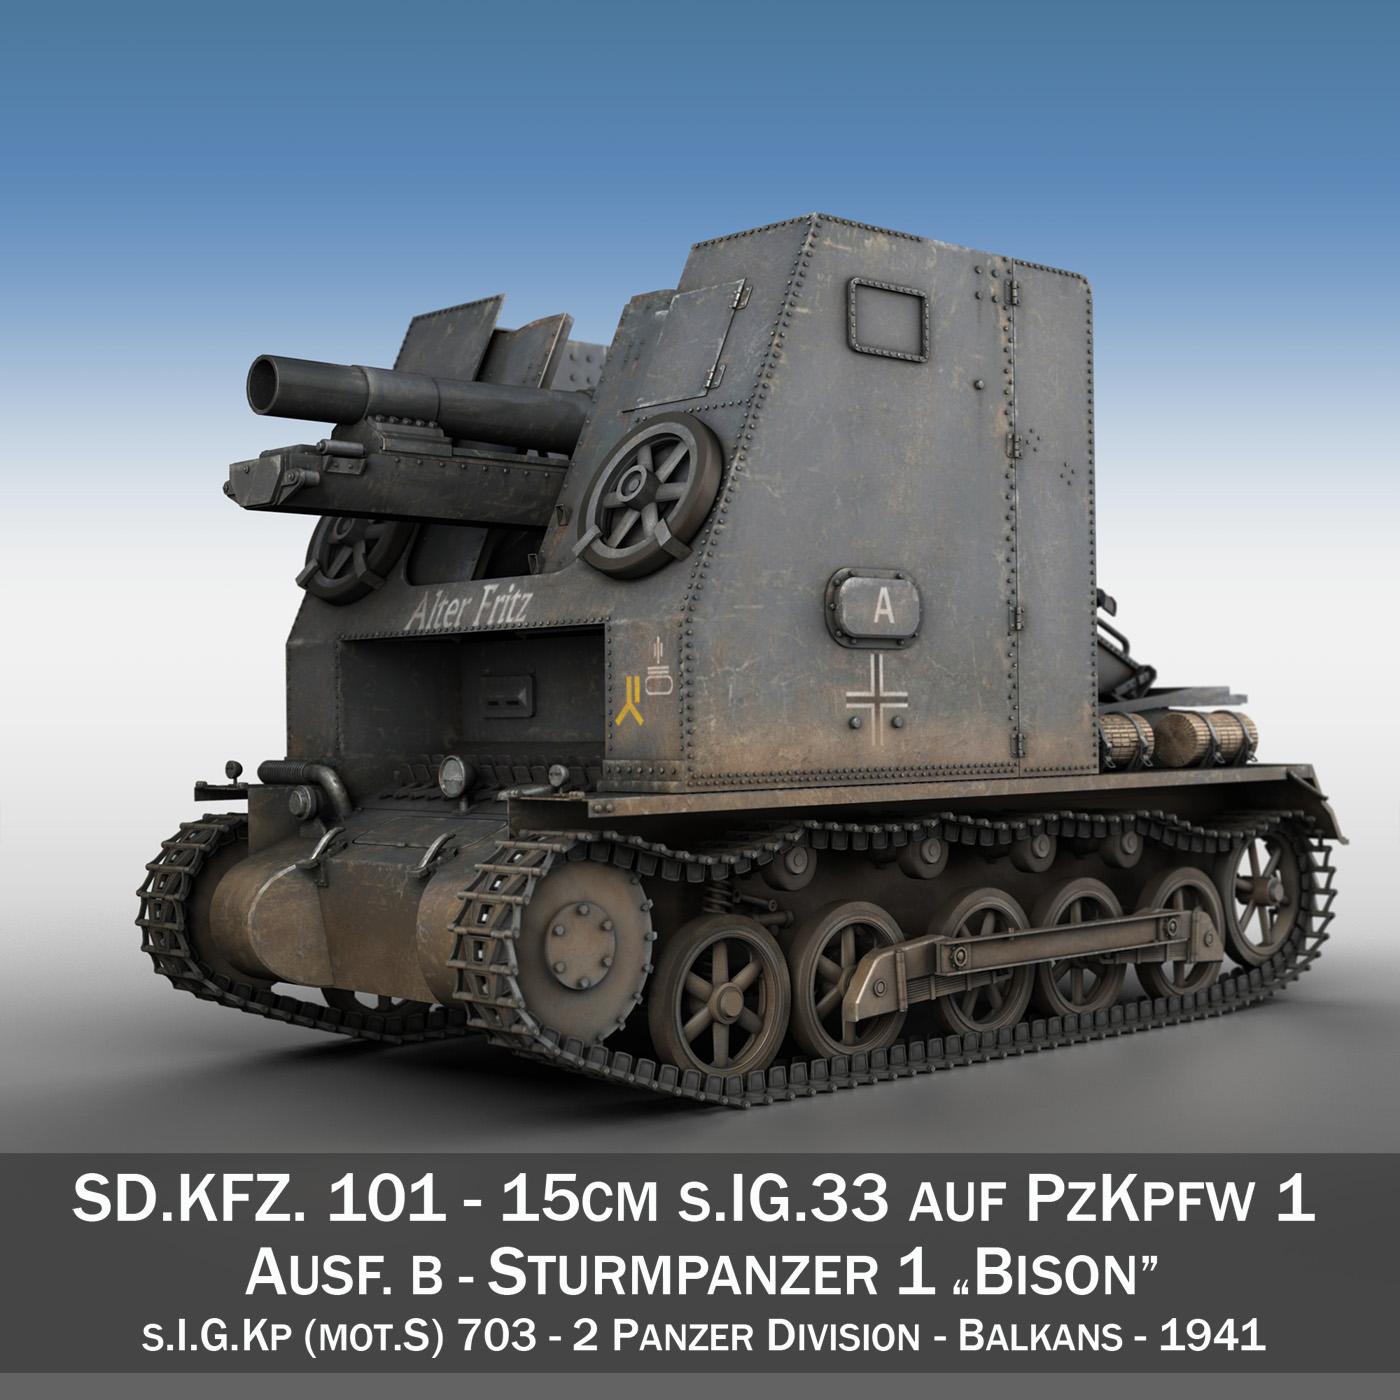 sturmpanzer 1 - bíosún - athrú fritz - 2pzdiv Samhail 3d 3ds fbx l d l l l l l l l l l l l l ln lzzum 4